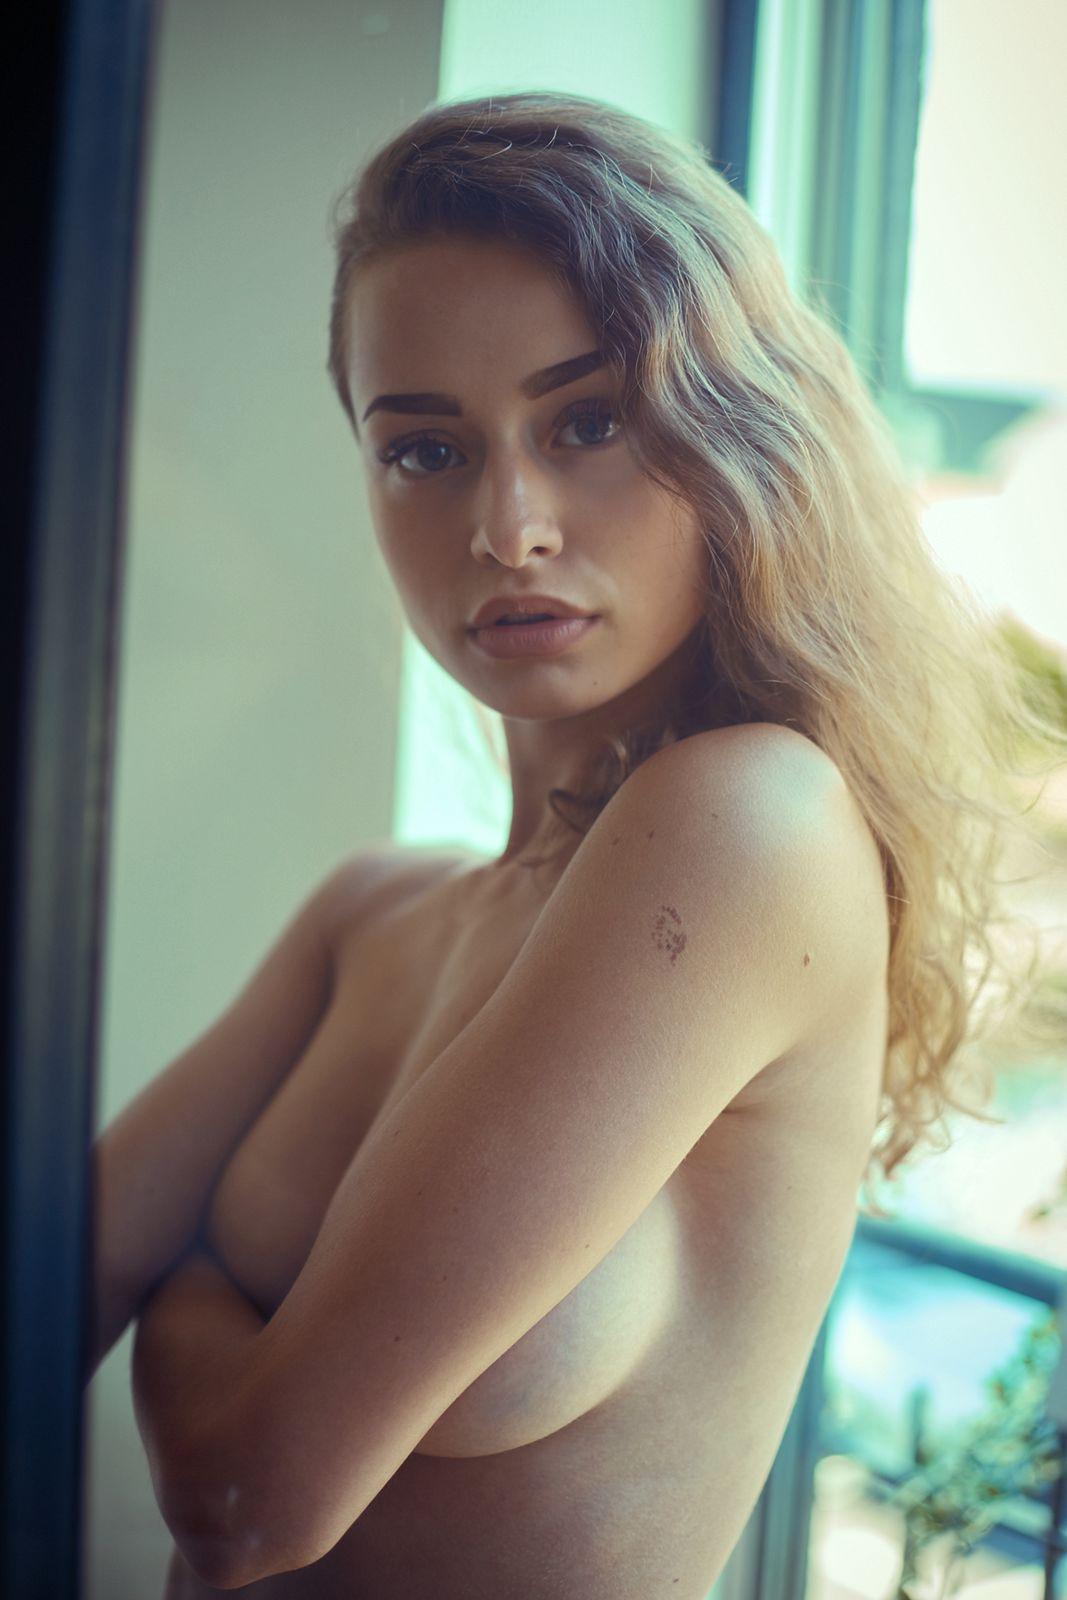 Lionsmag nude model magazine lingerie editorials Luisa Leipold